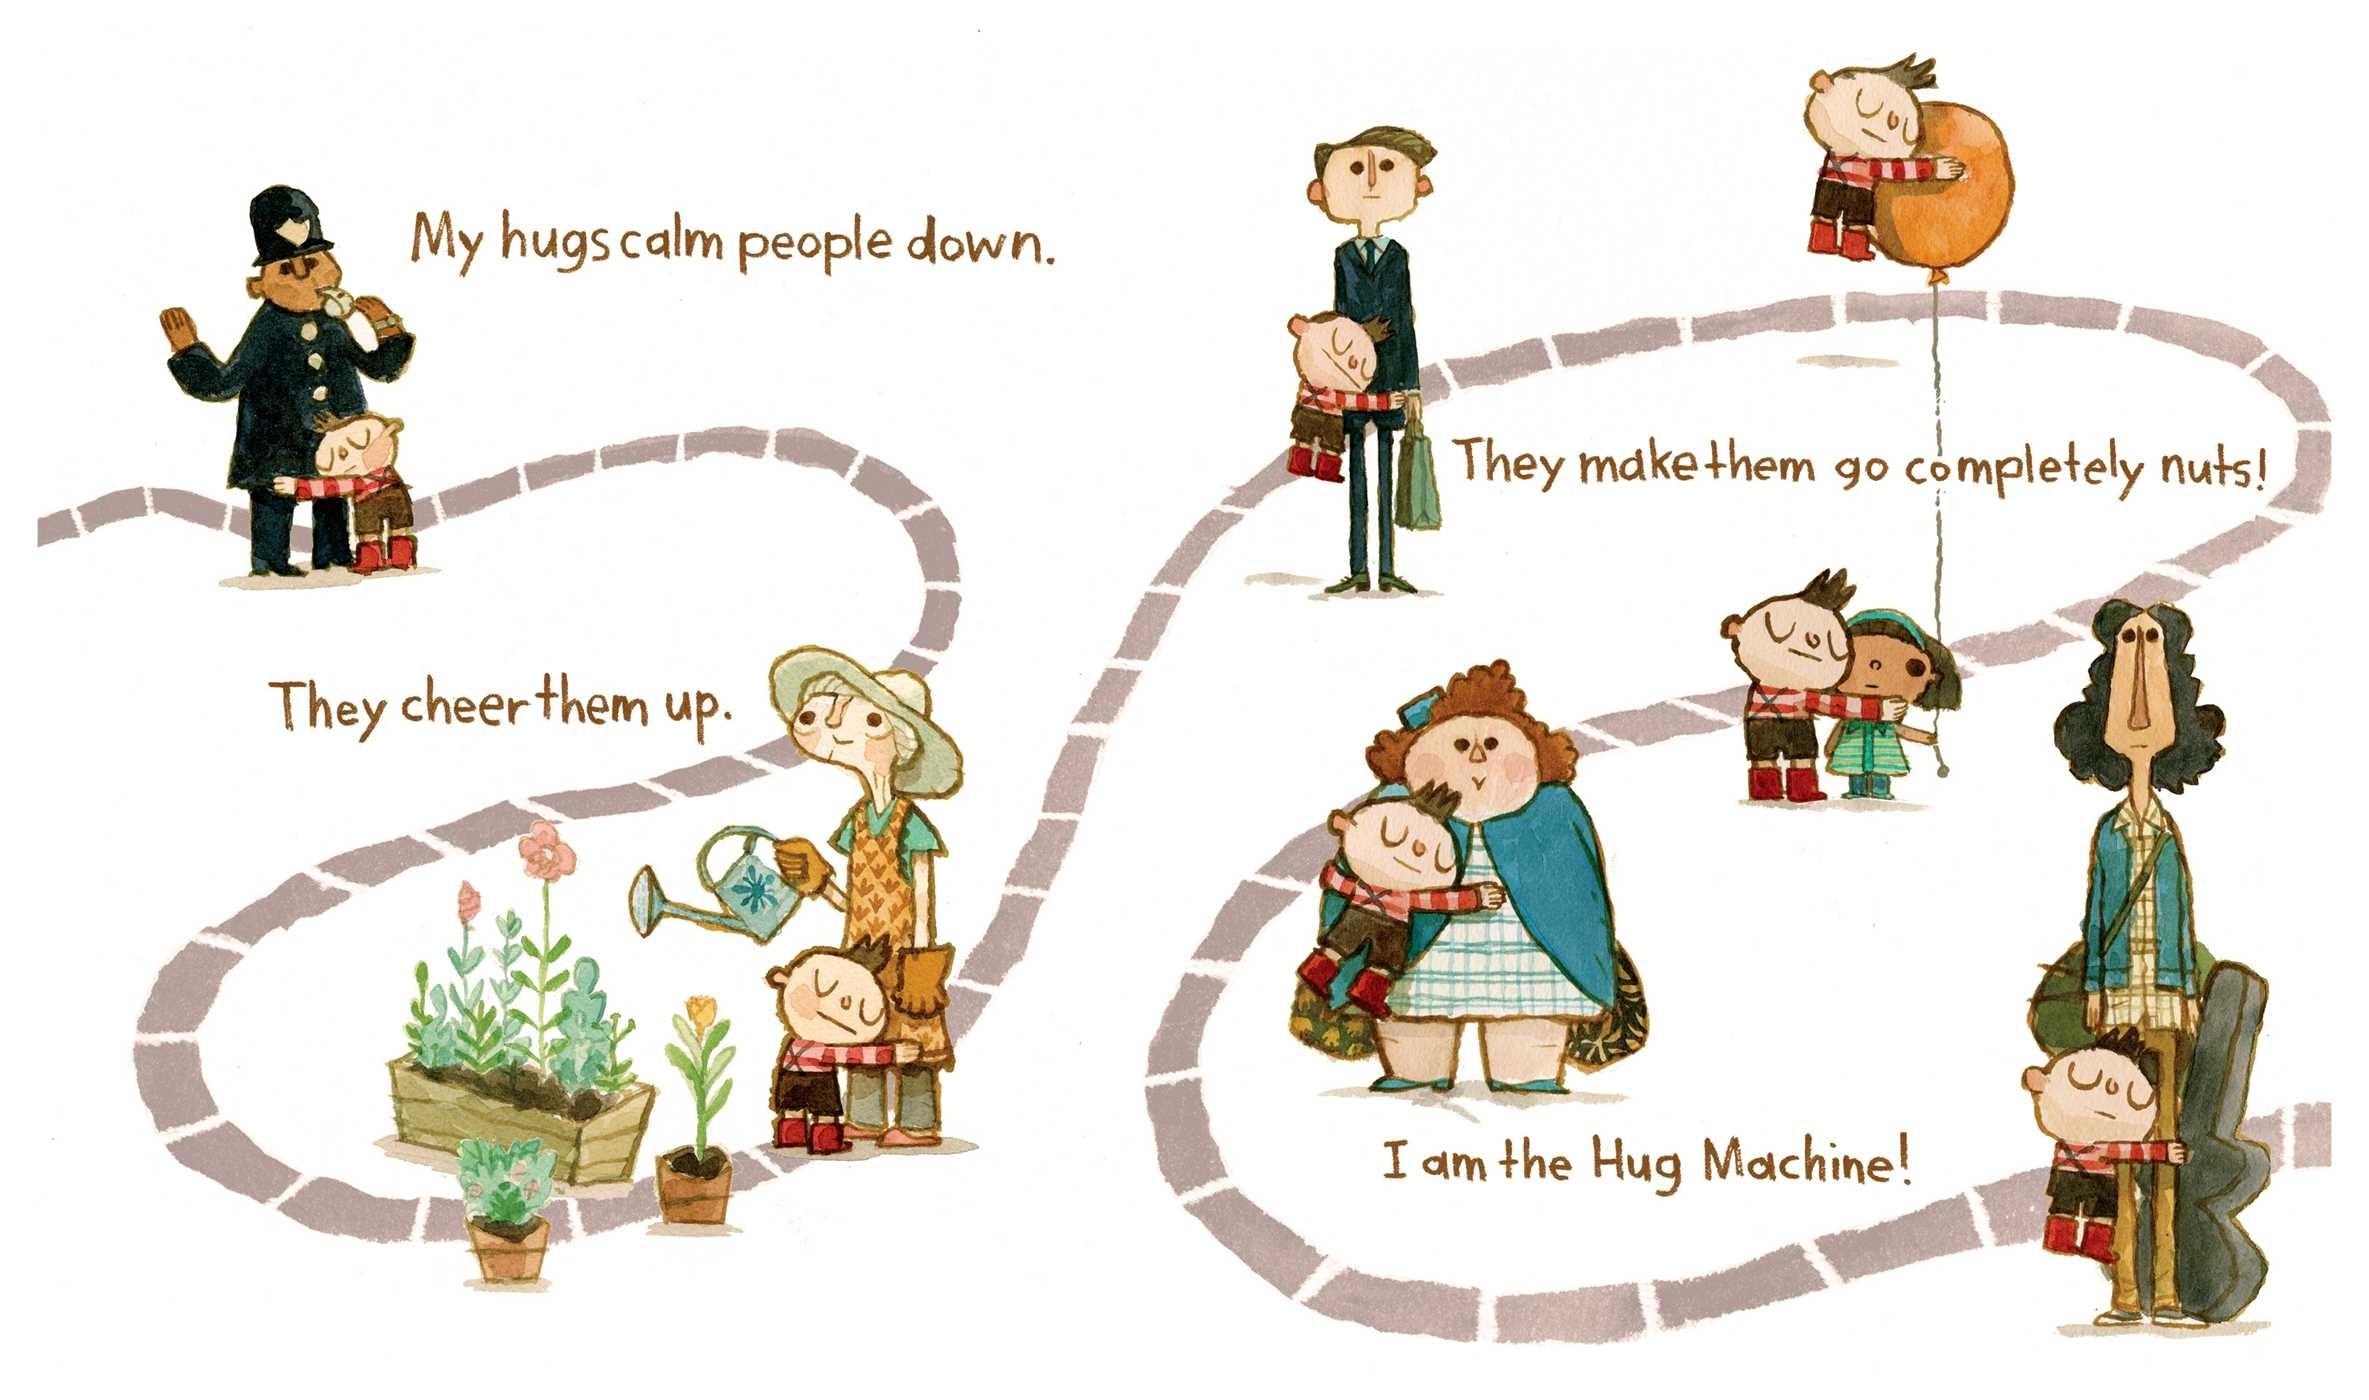 Hug machine 9781534400269.in02